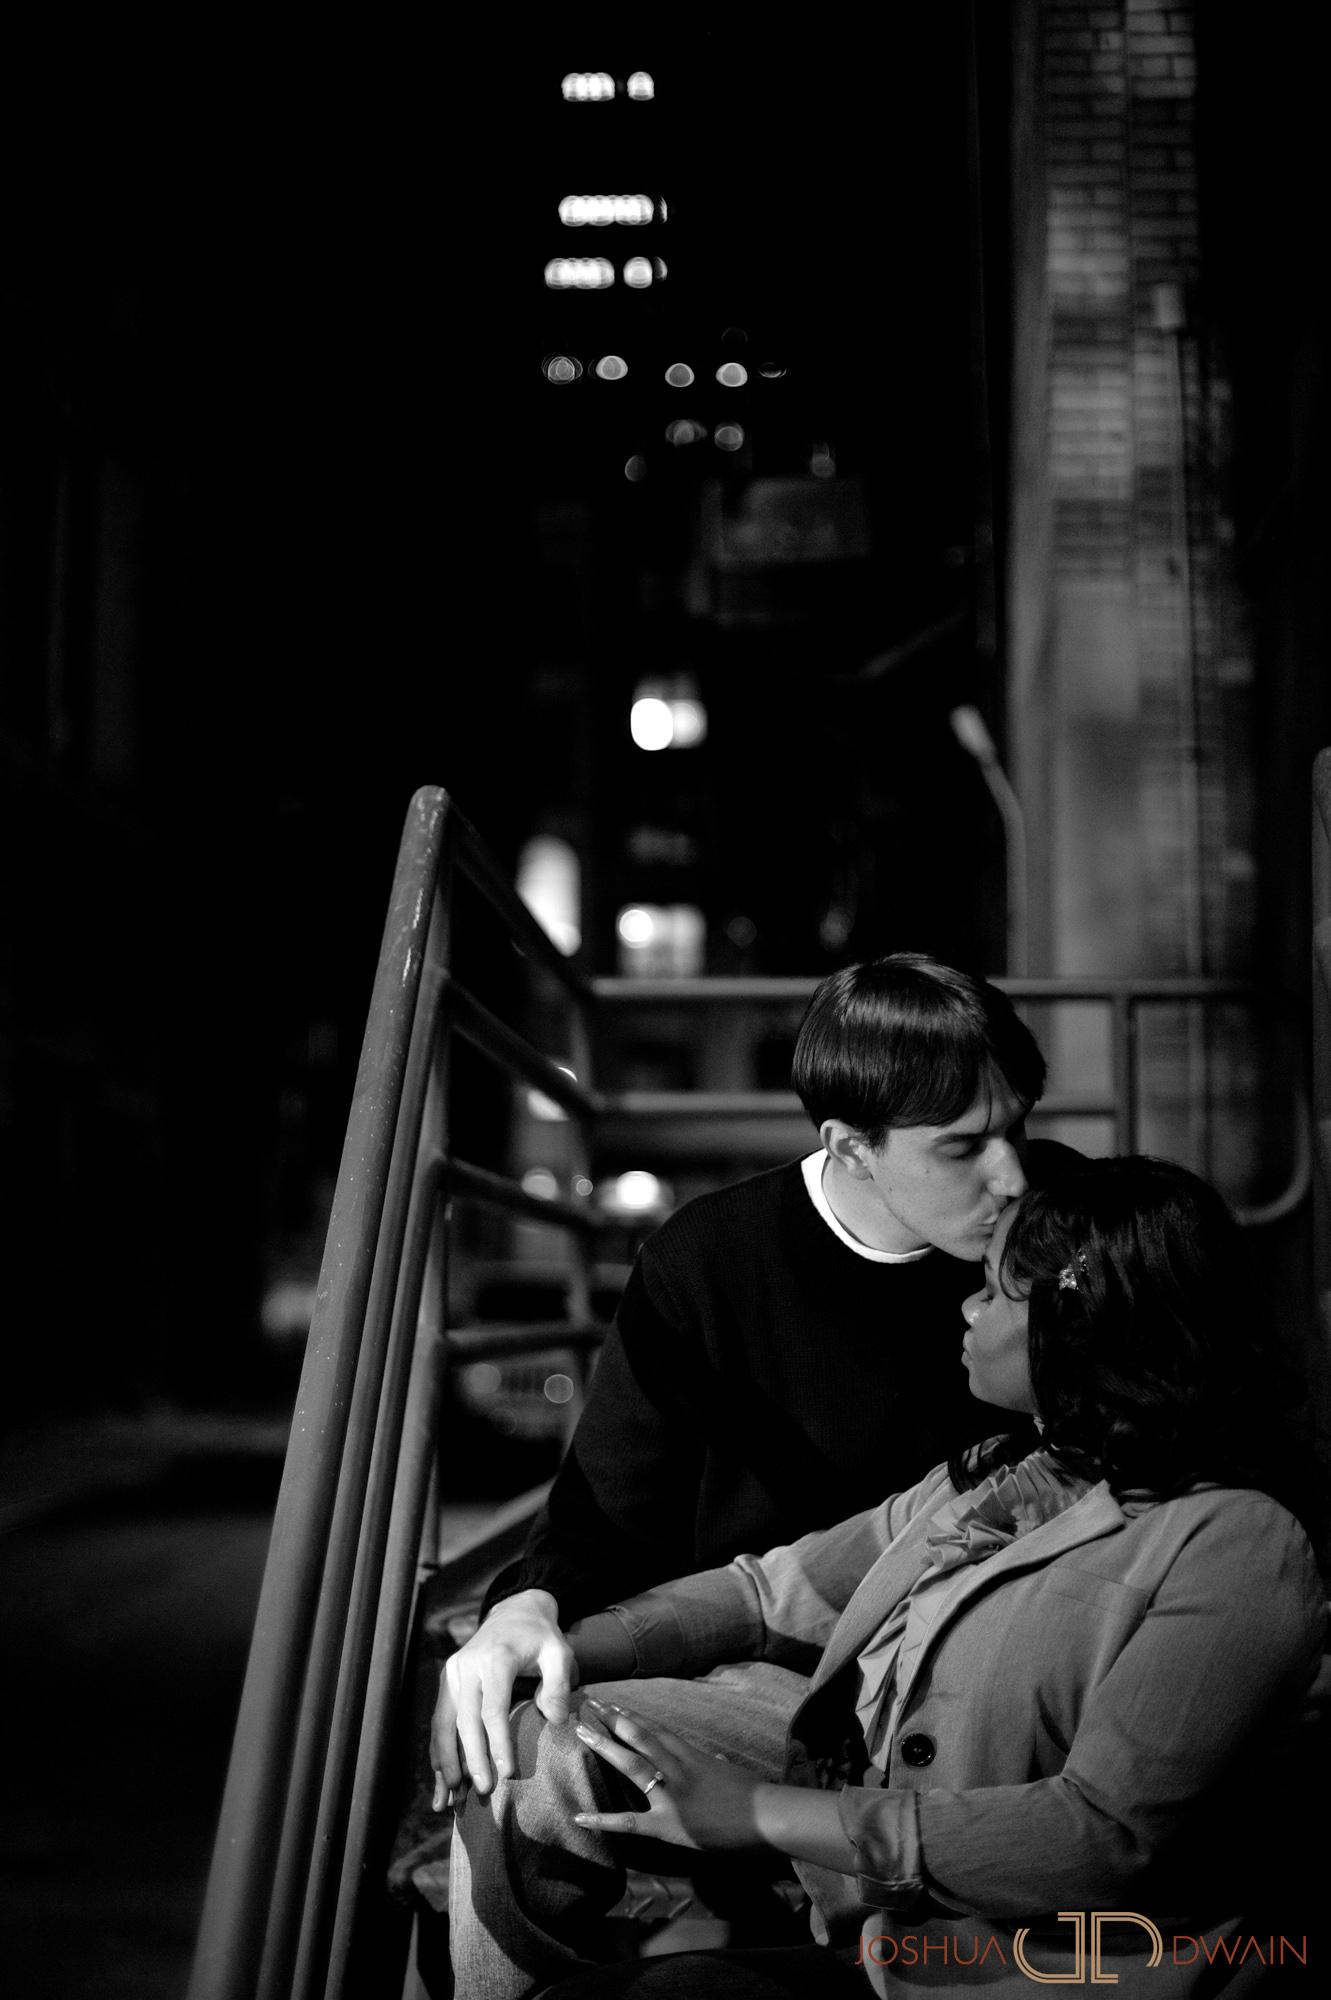 fritzie-stephen-010-central-park-new-york-city-ny-engagement-photographer-joshua-dwain-2011-11-05_fs_058